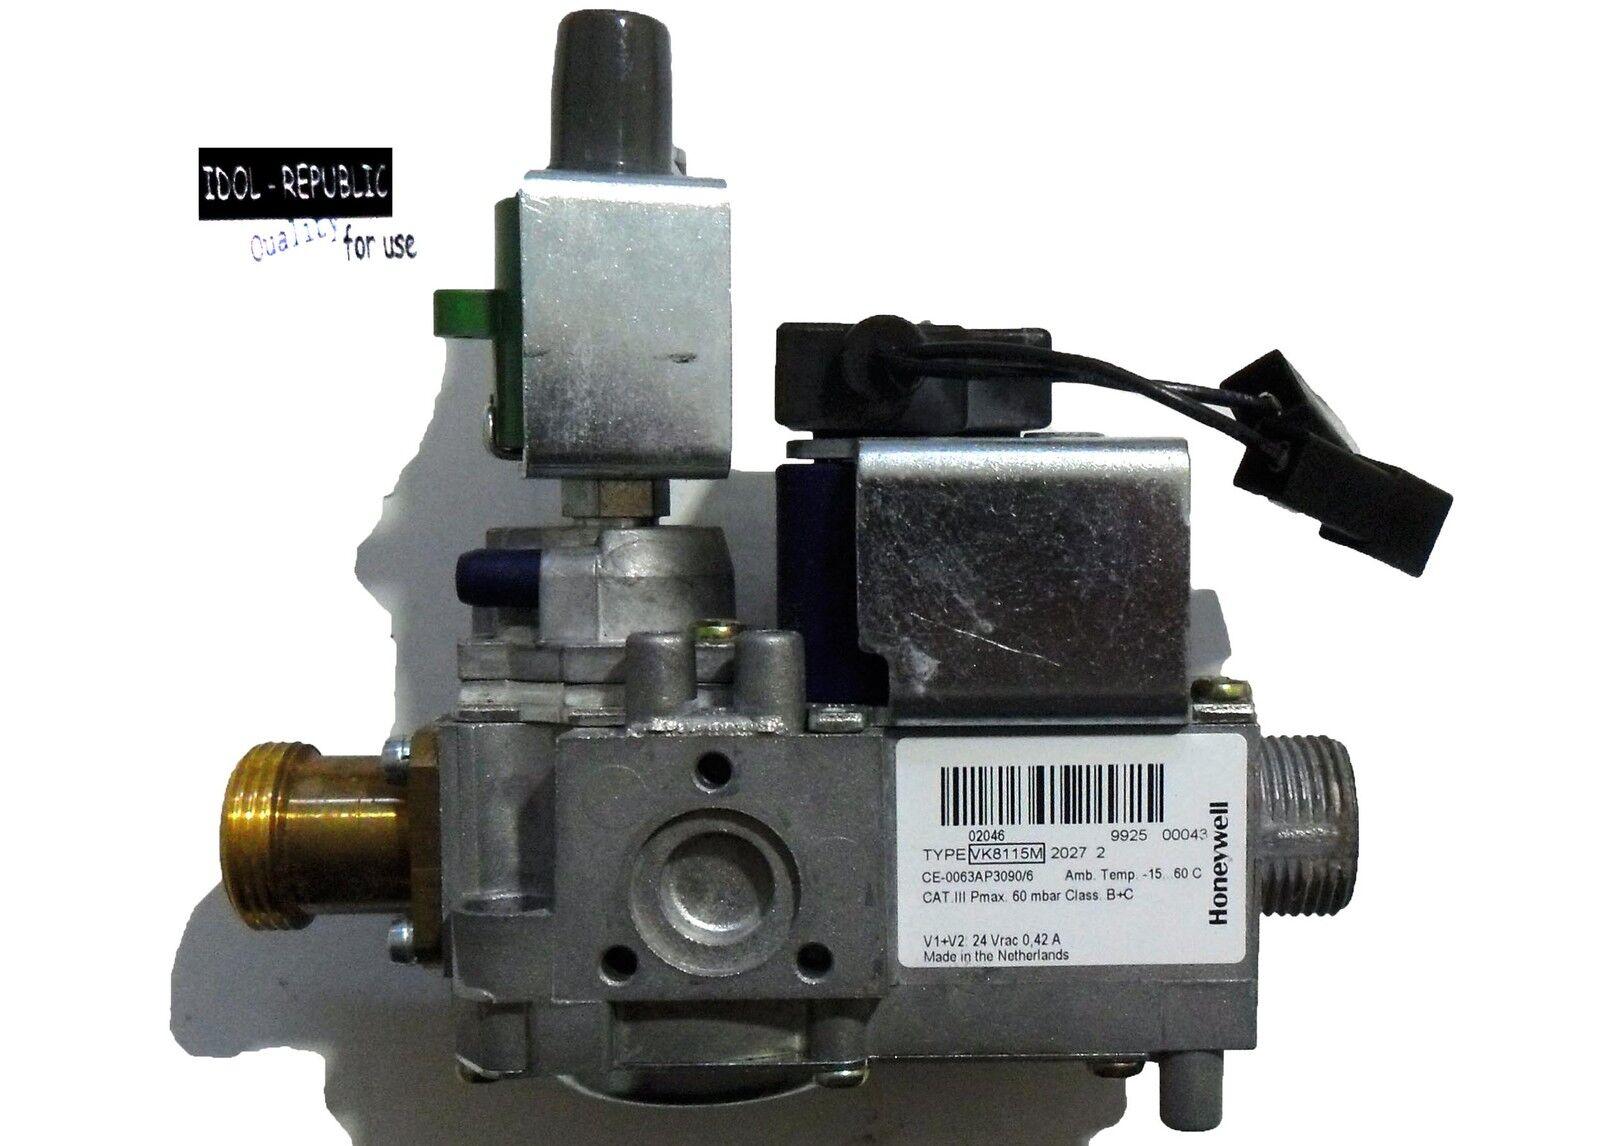 Buderus - Honeywell - VK8115M 2027 2 - - - Gaskombiregler - VK 8115M 042374